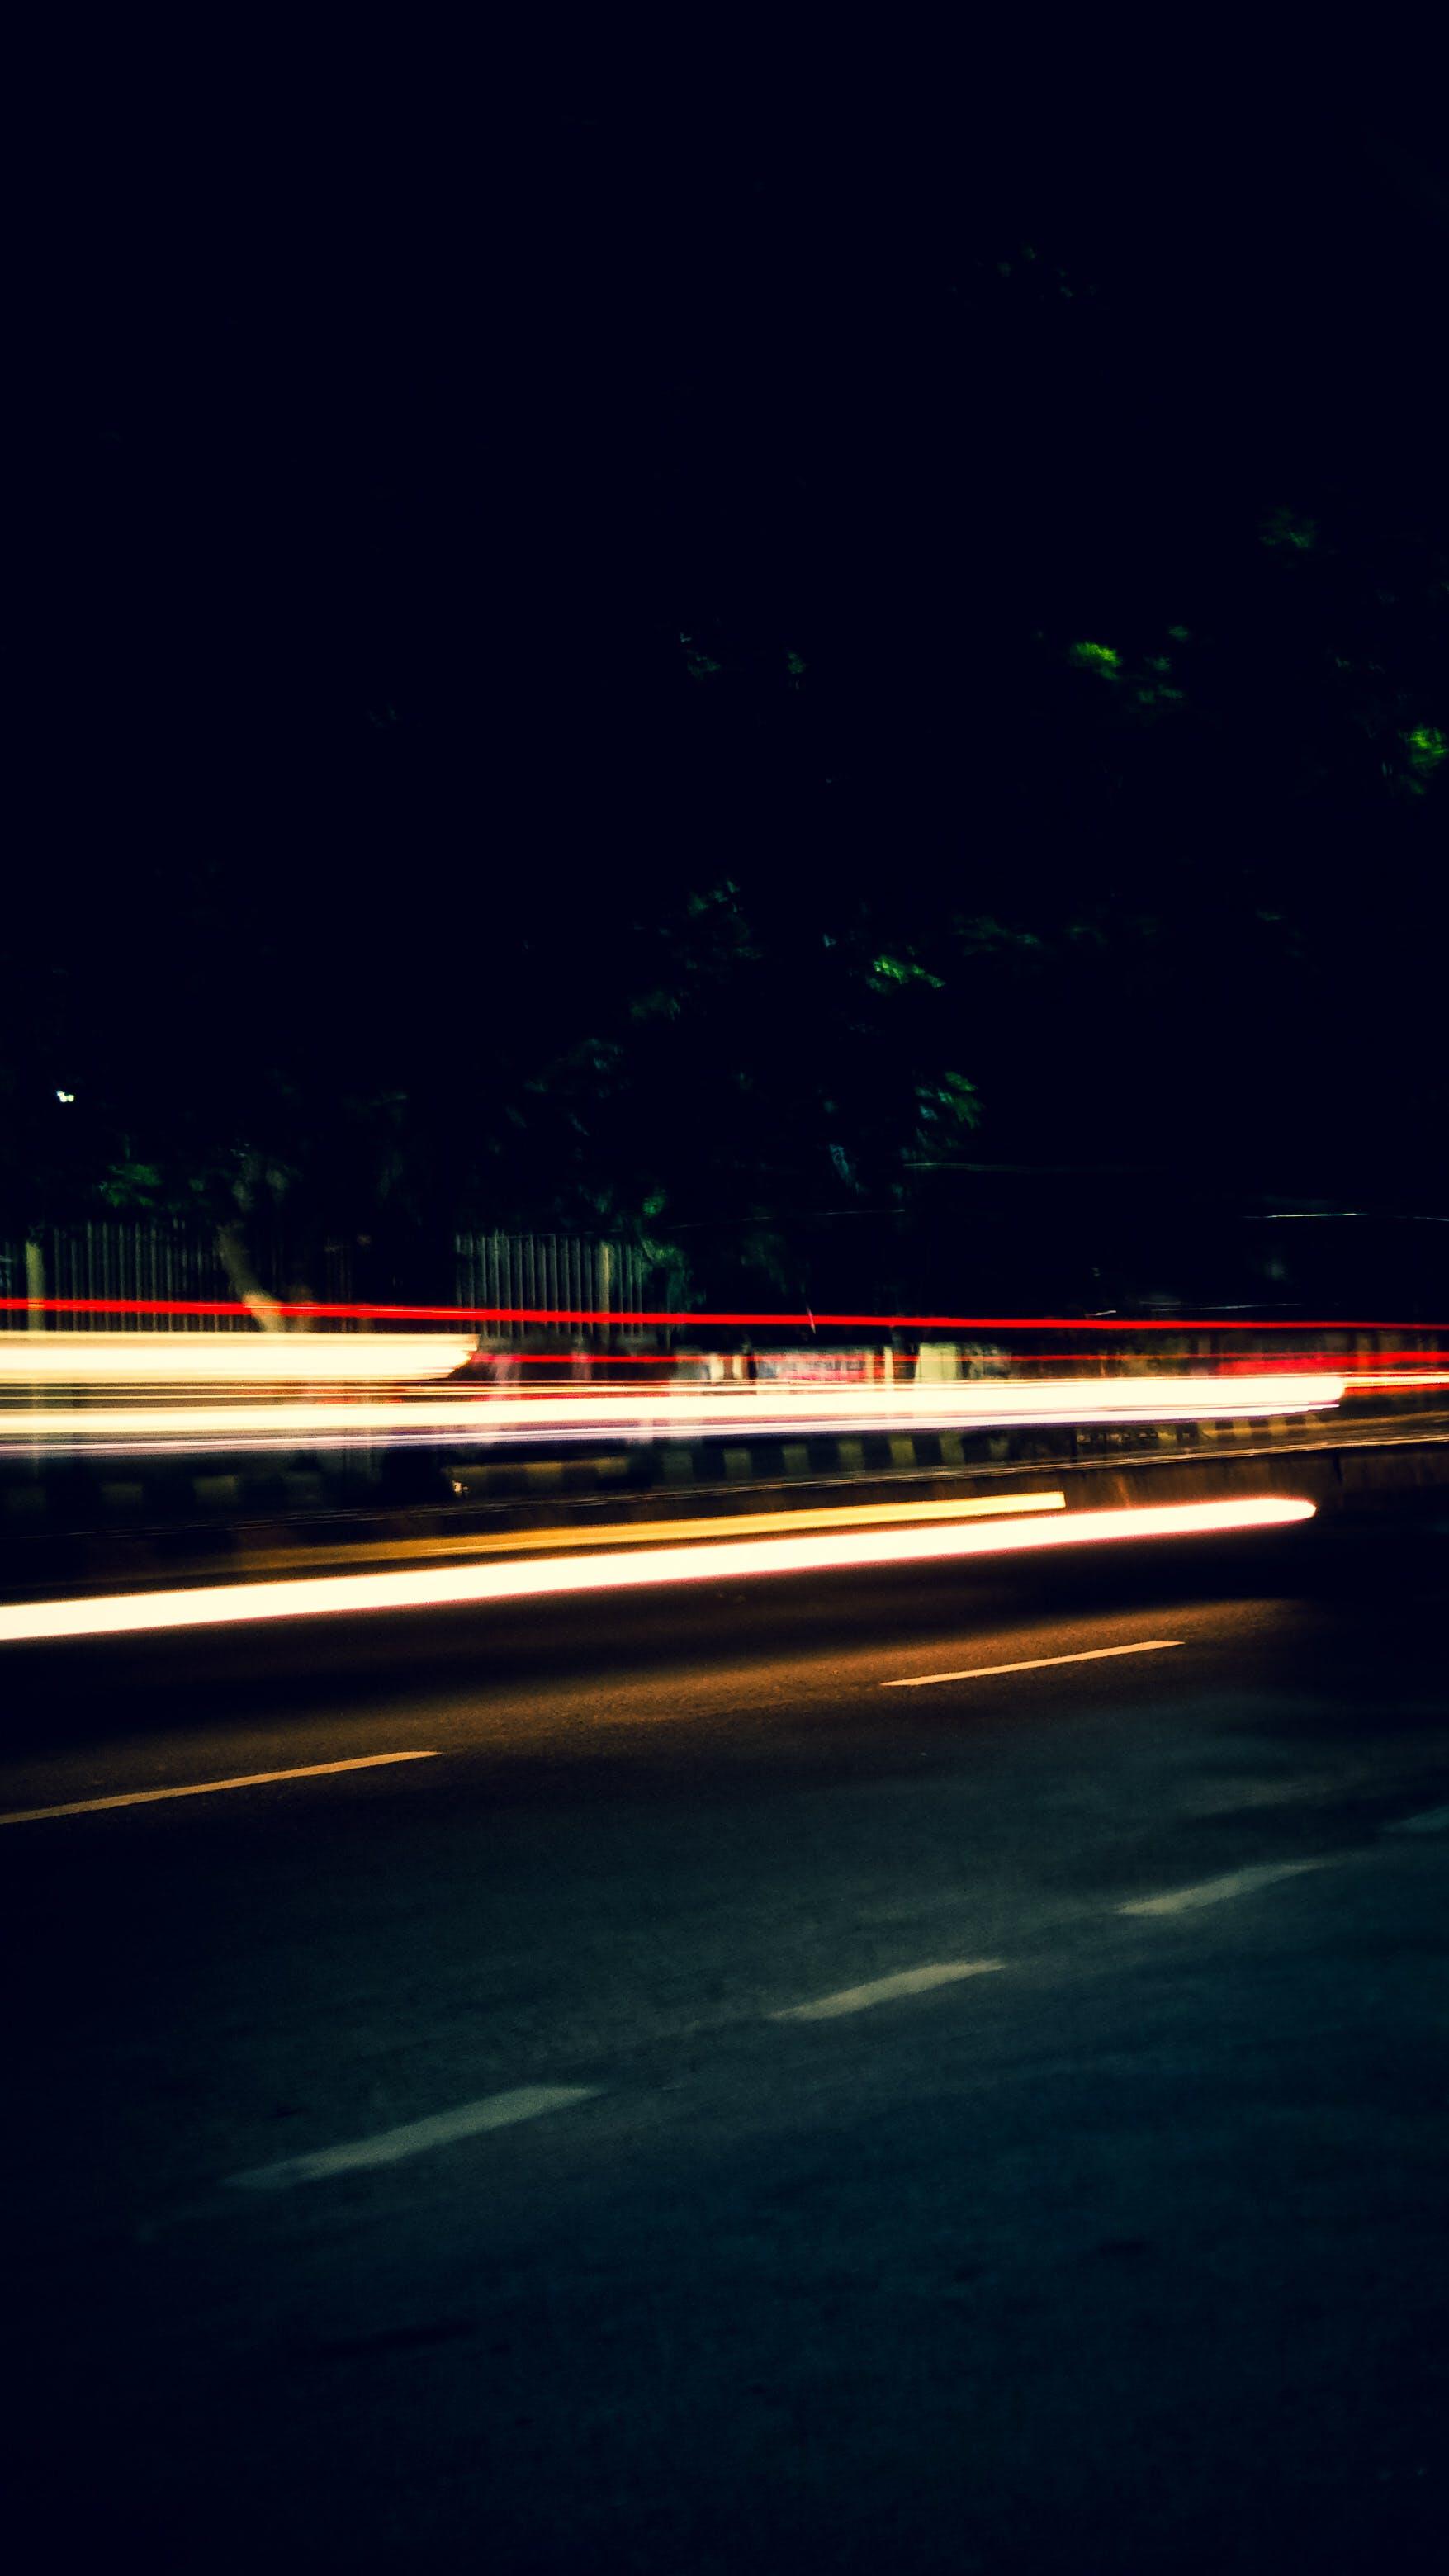 Free stock photo of #cityvibes, #cityvibesphotochallenge, #mobilechallenge, #mobilephotography